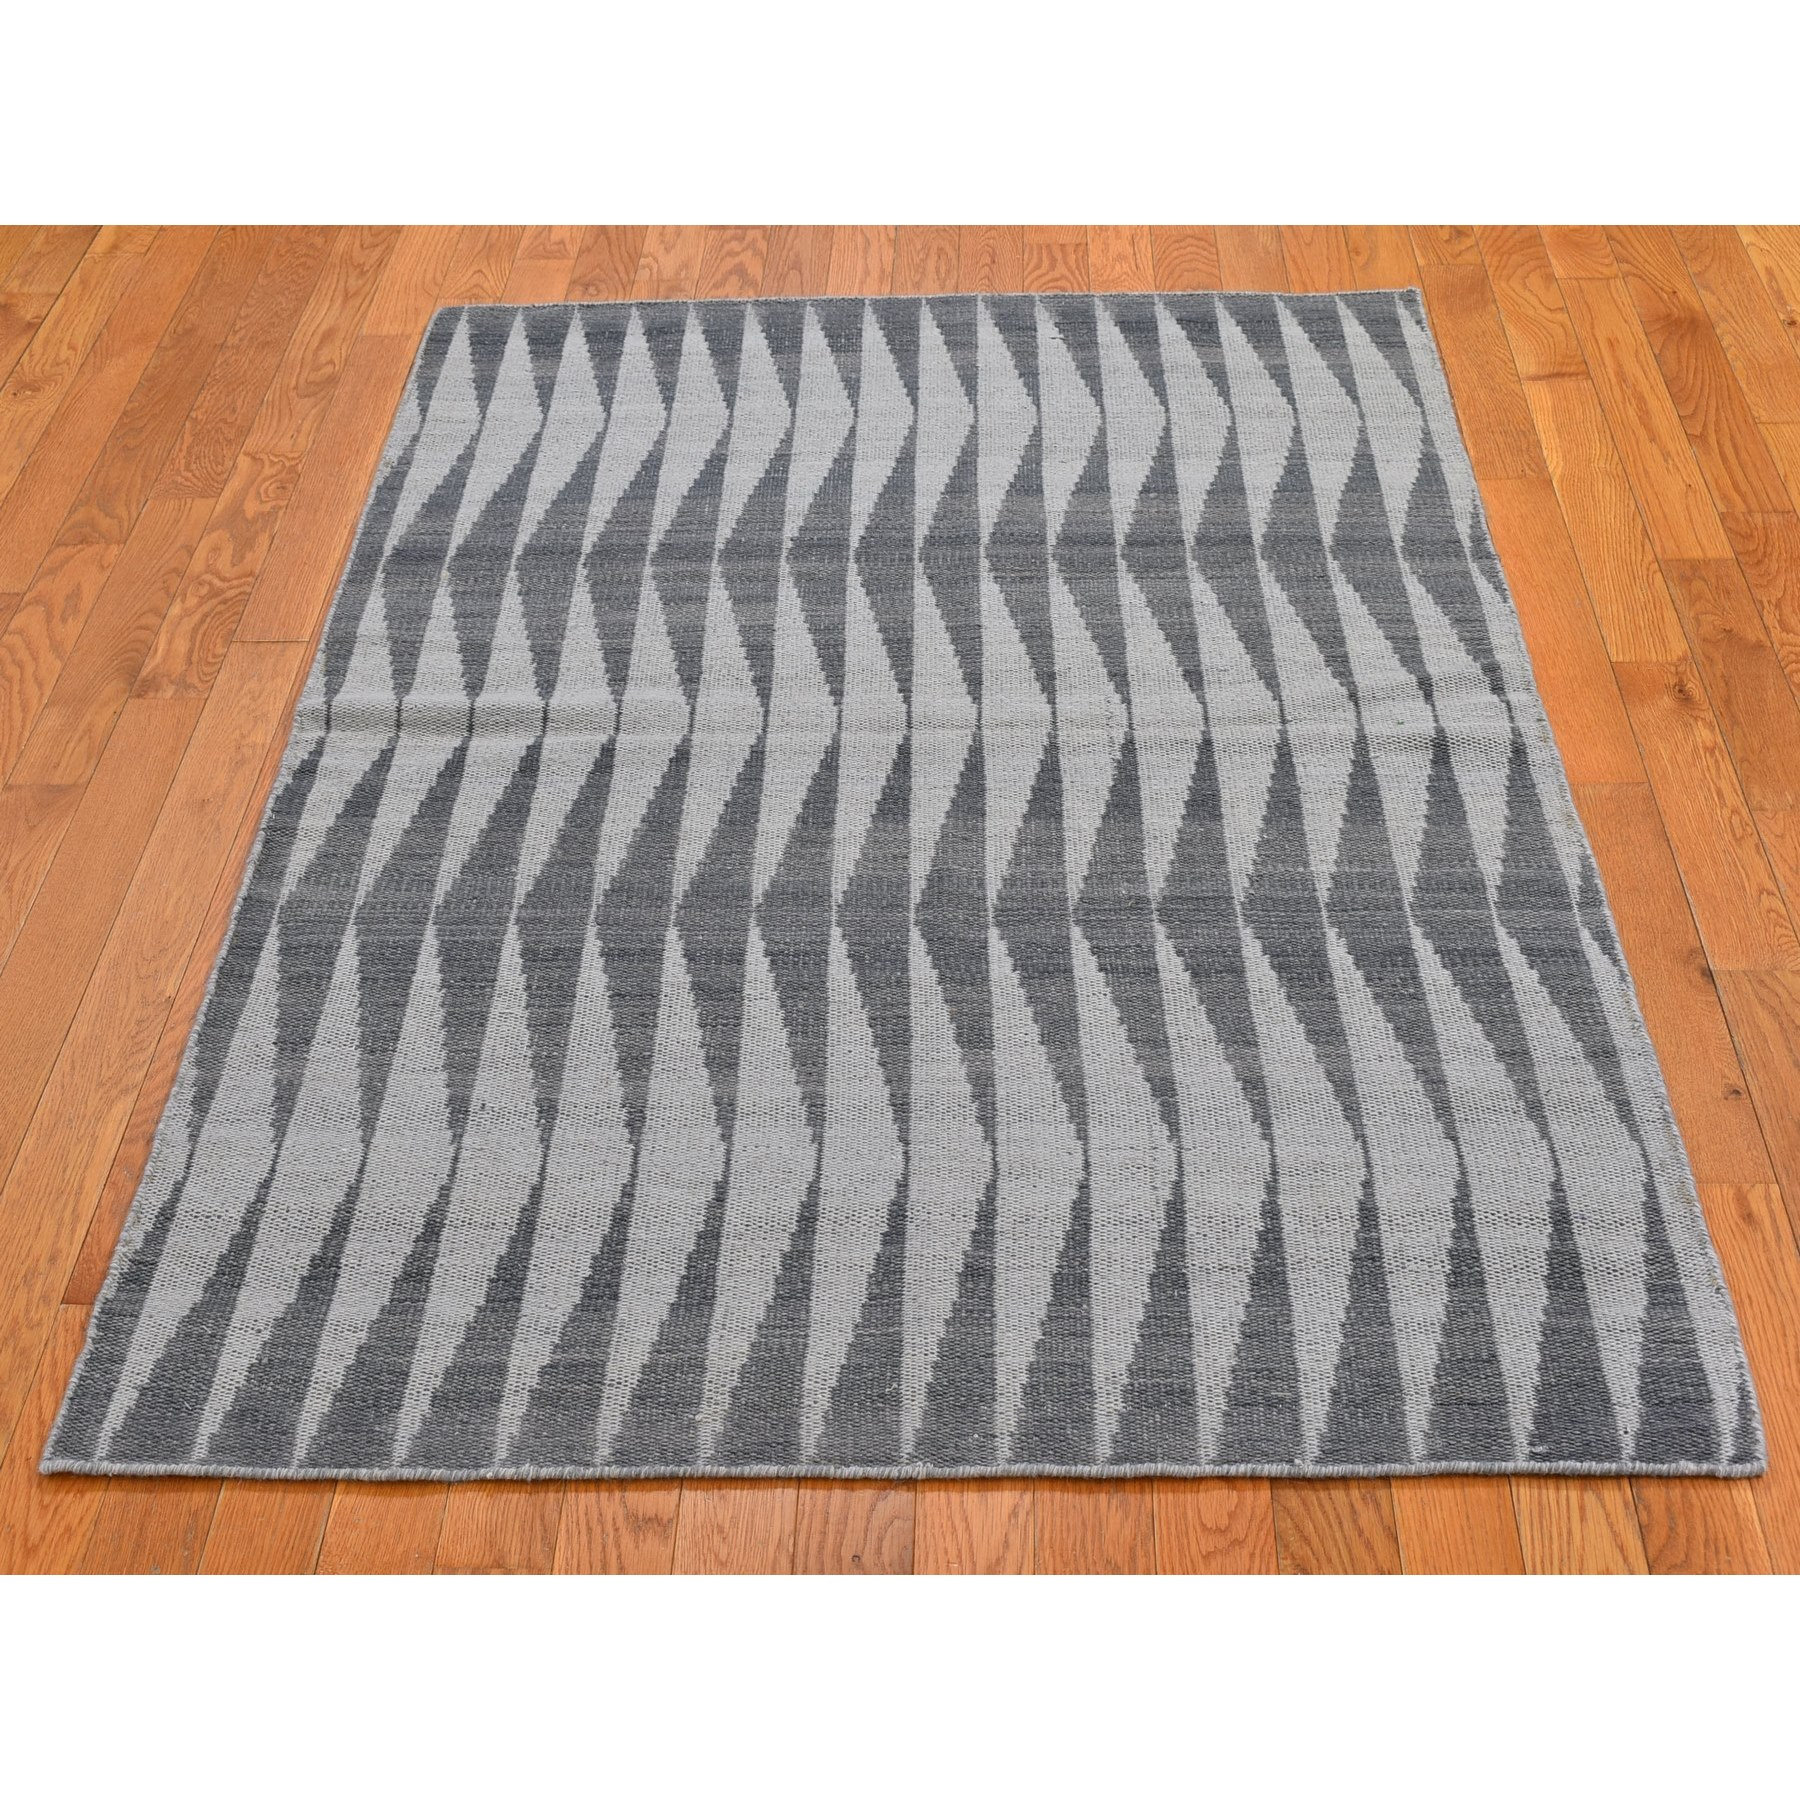 "4'x5'10"" Charcoal Gray Pure Wool Reversible Geometric Design Kilim Flat Weave Hand Woven Oriental Rug"